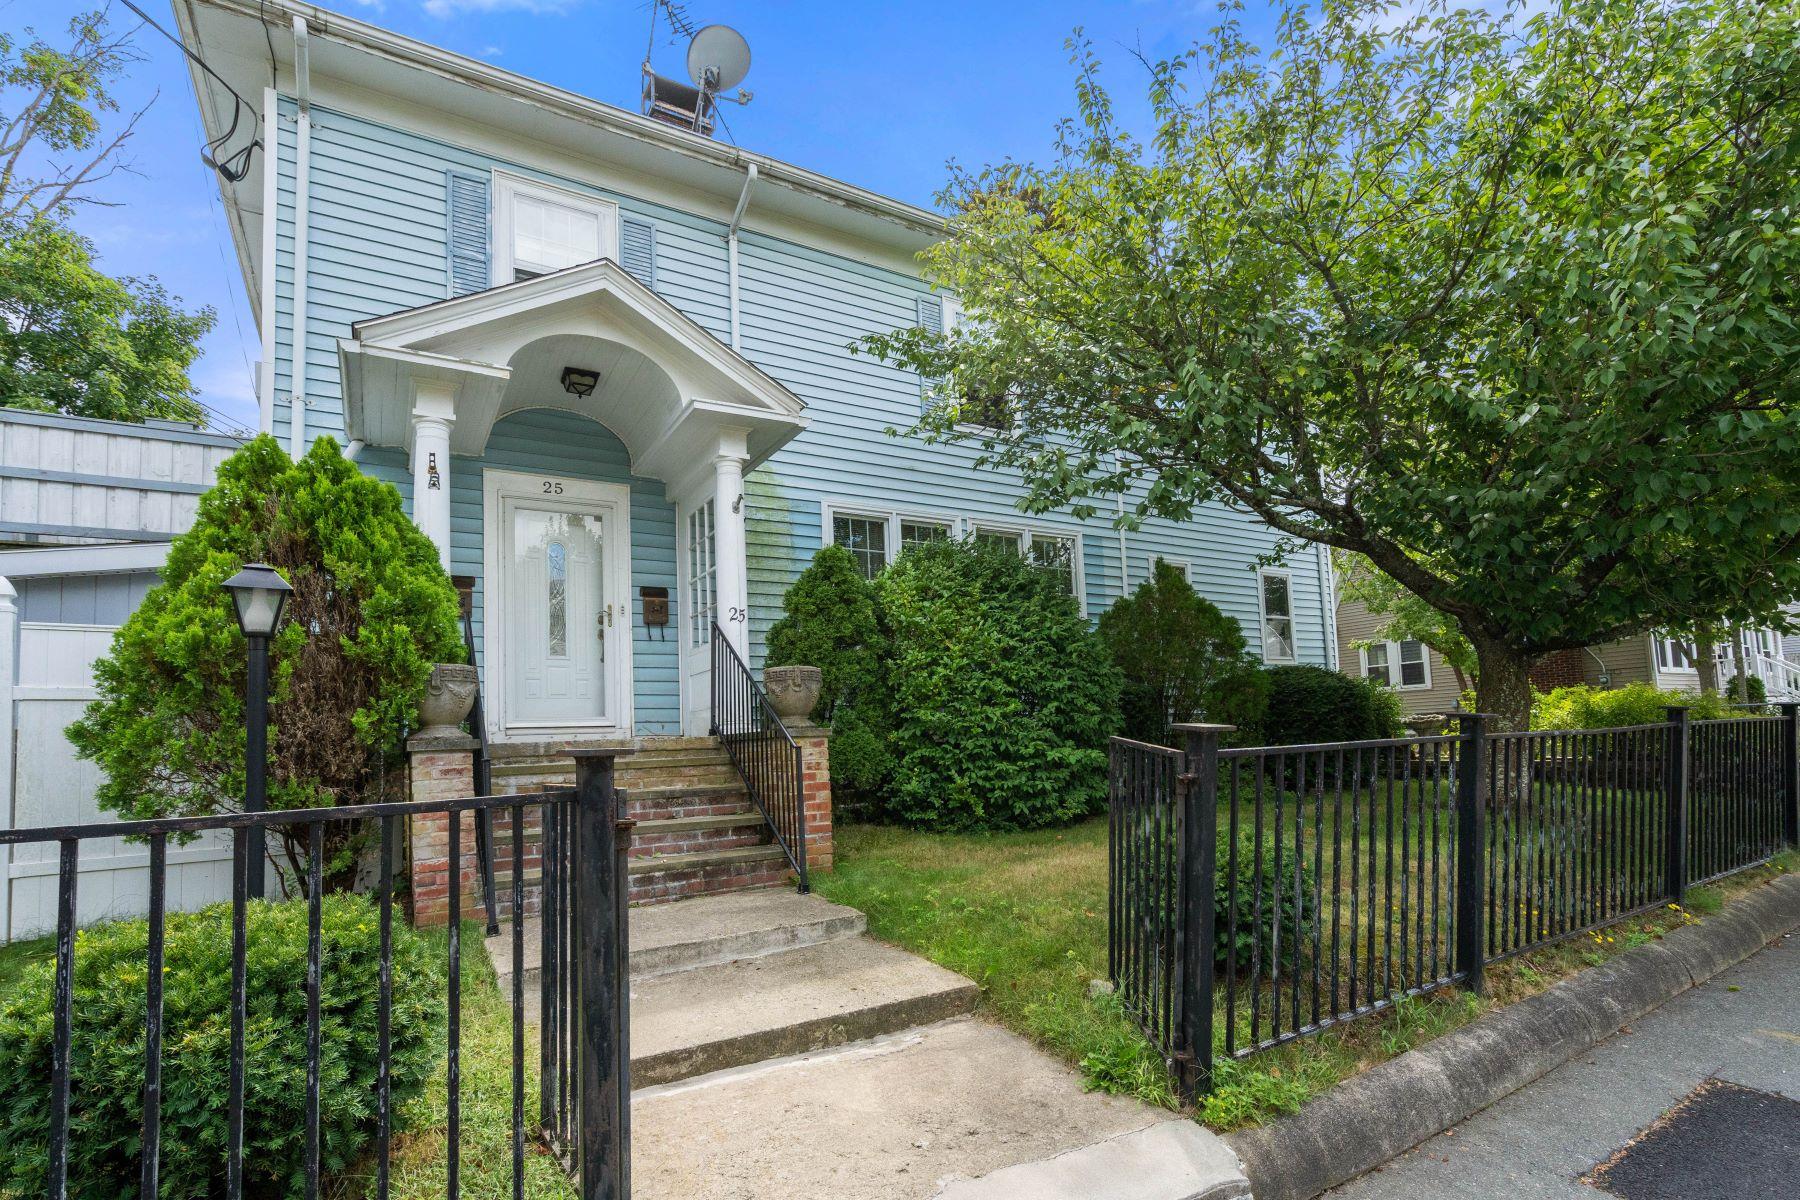 Multi-Family Homes 为 销售 在 25 Field Street, Brockton 25 Field St 布罗克顿, 马萨诸塞州 02301 美国